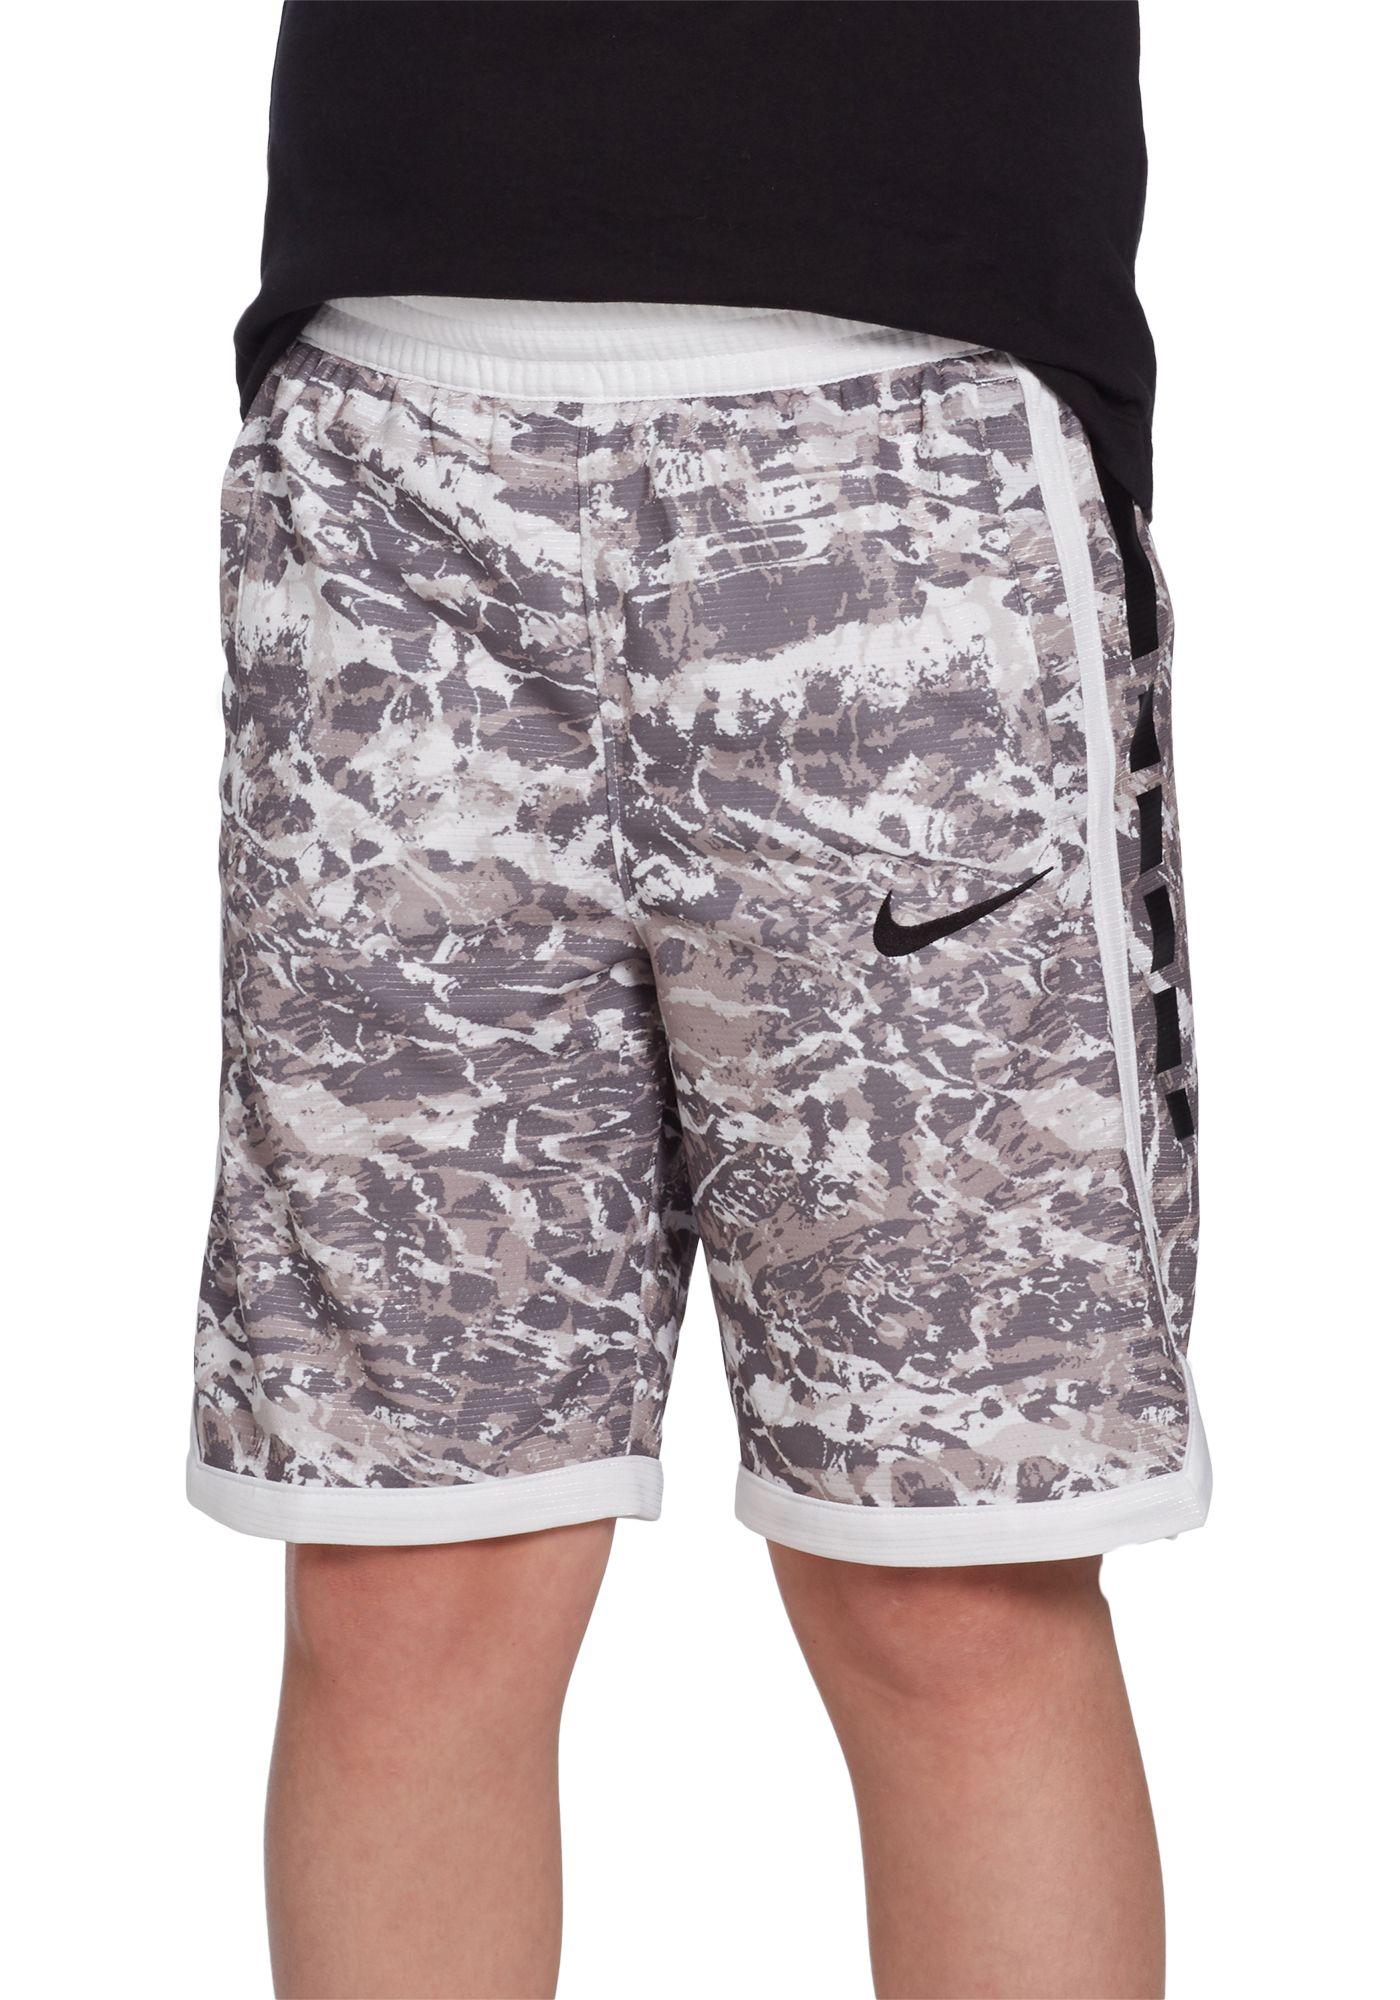 Nike Boys' Dri-FIT Elite Printed Basketball Shorts